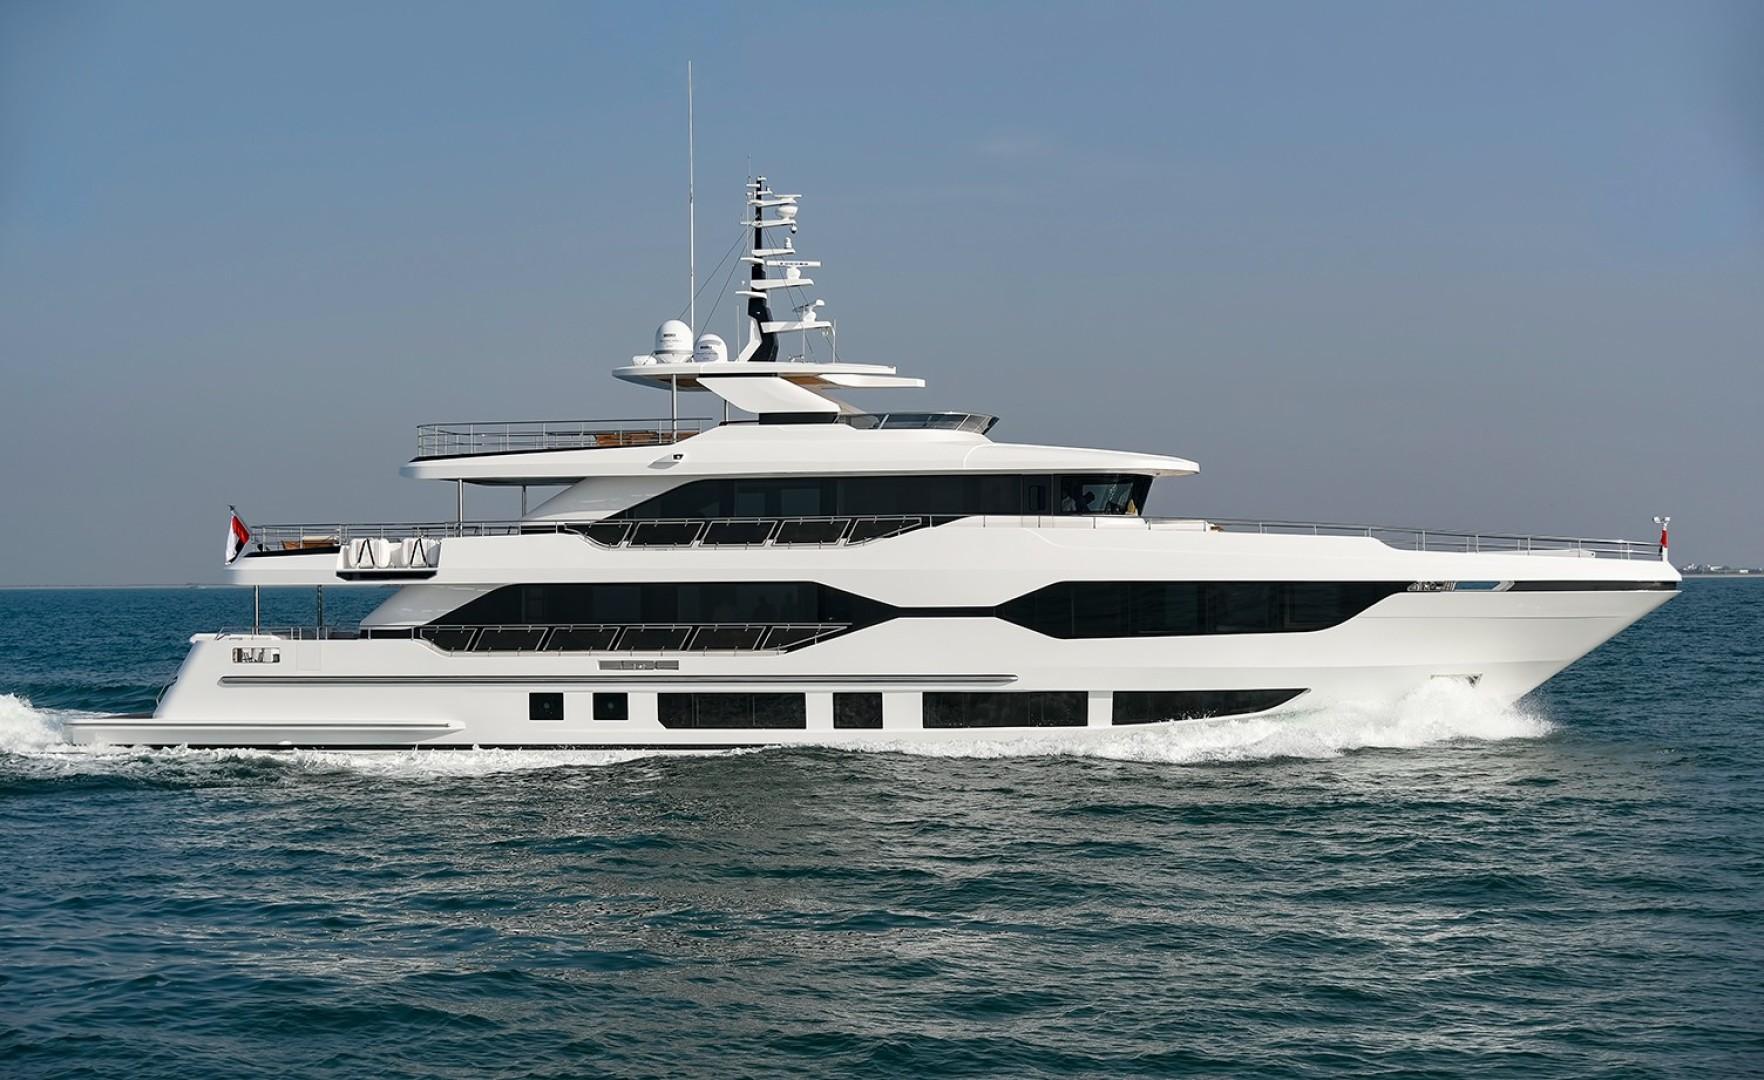 MAJESTY 120 is a Majesty Yachts Raised Pilothouse Yacht For Sale-Profile-0